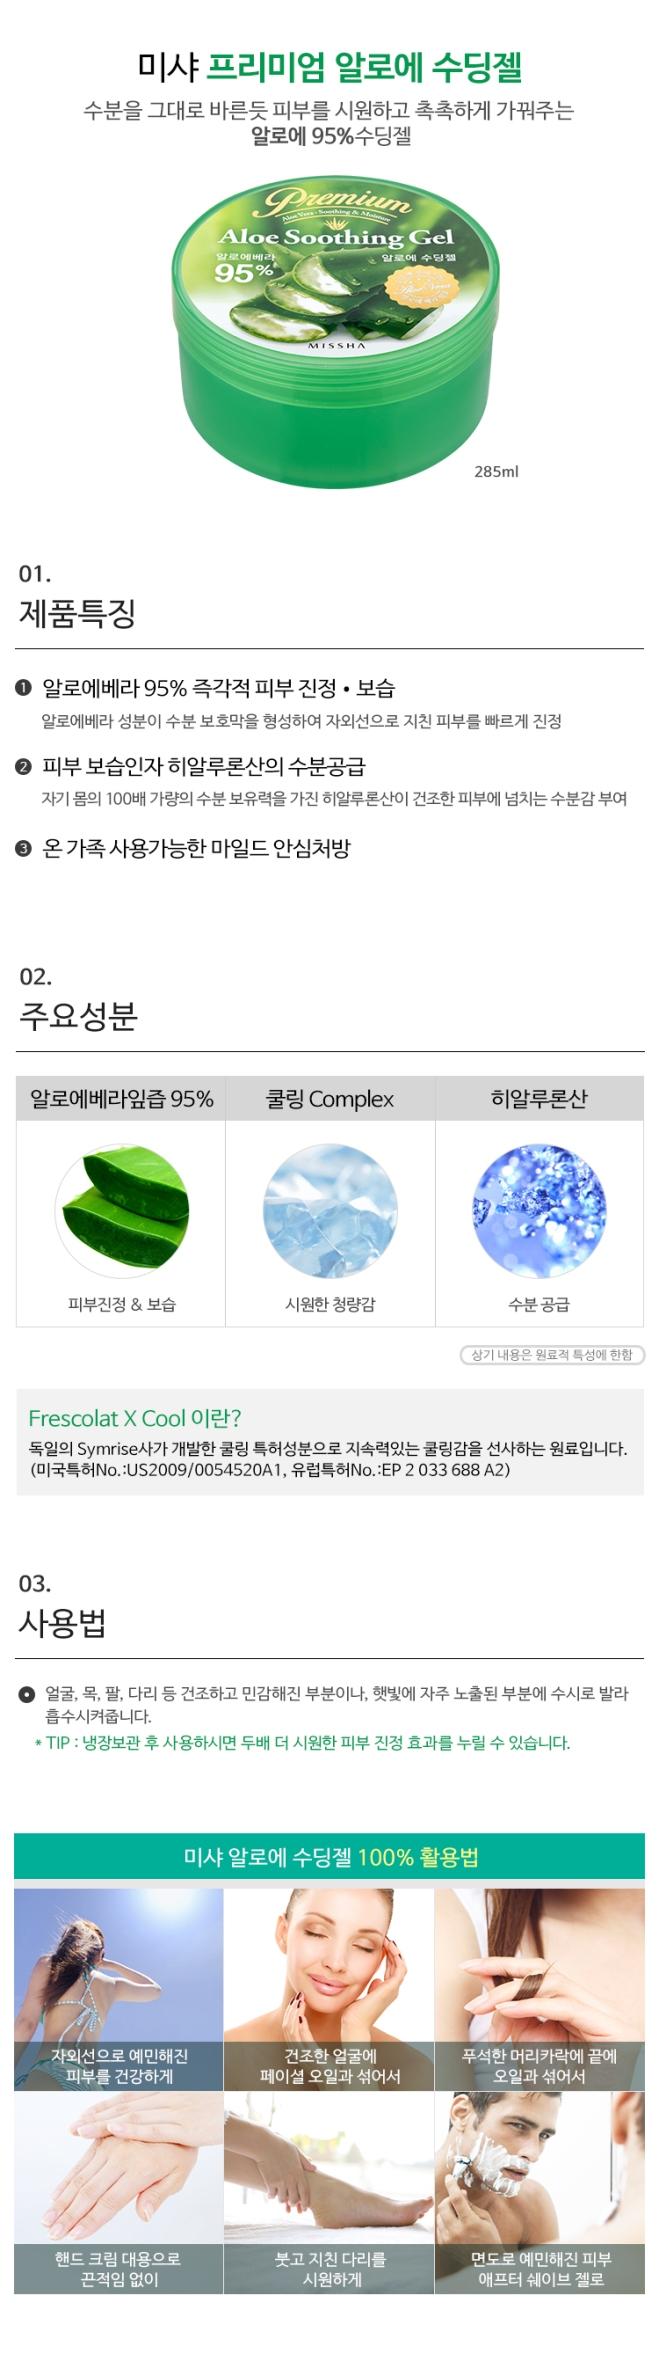 Credit: Missha Korea website